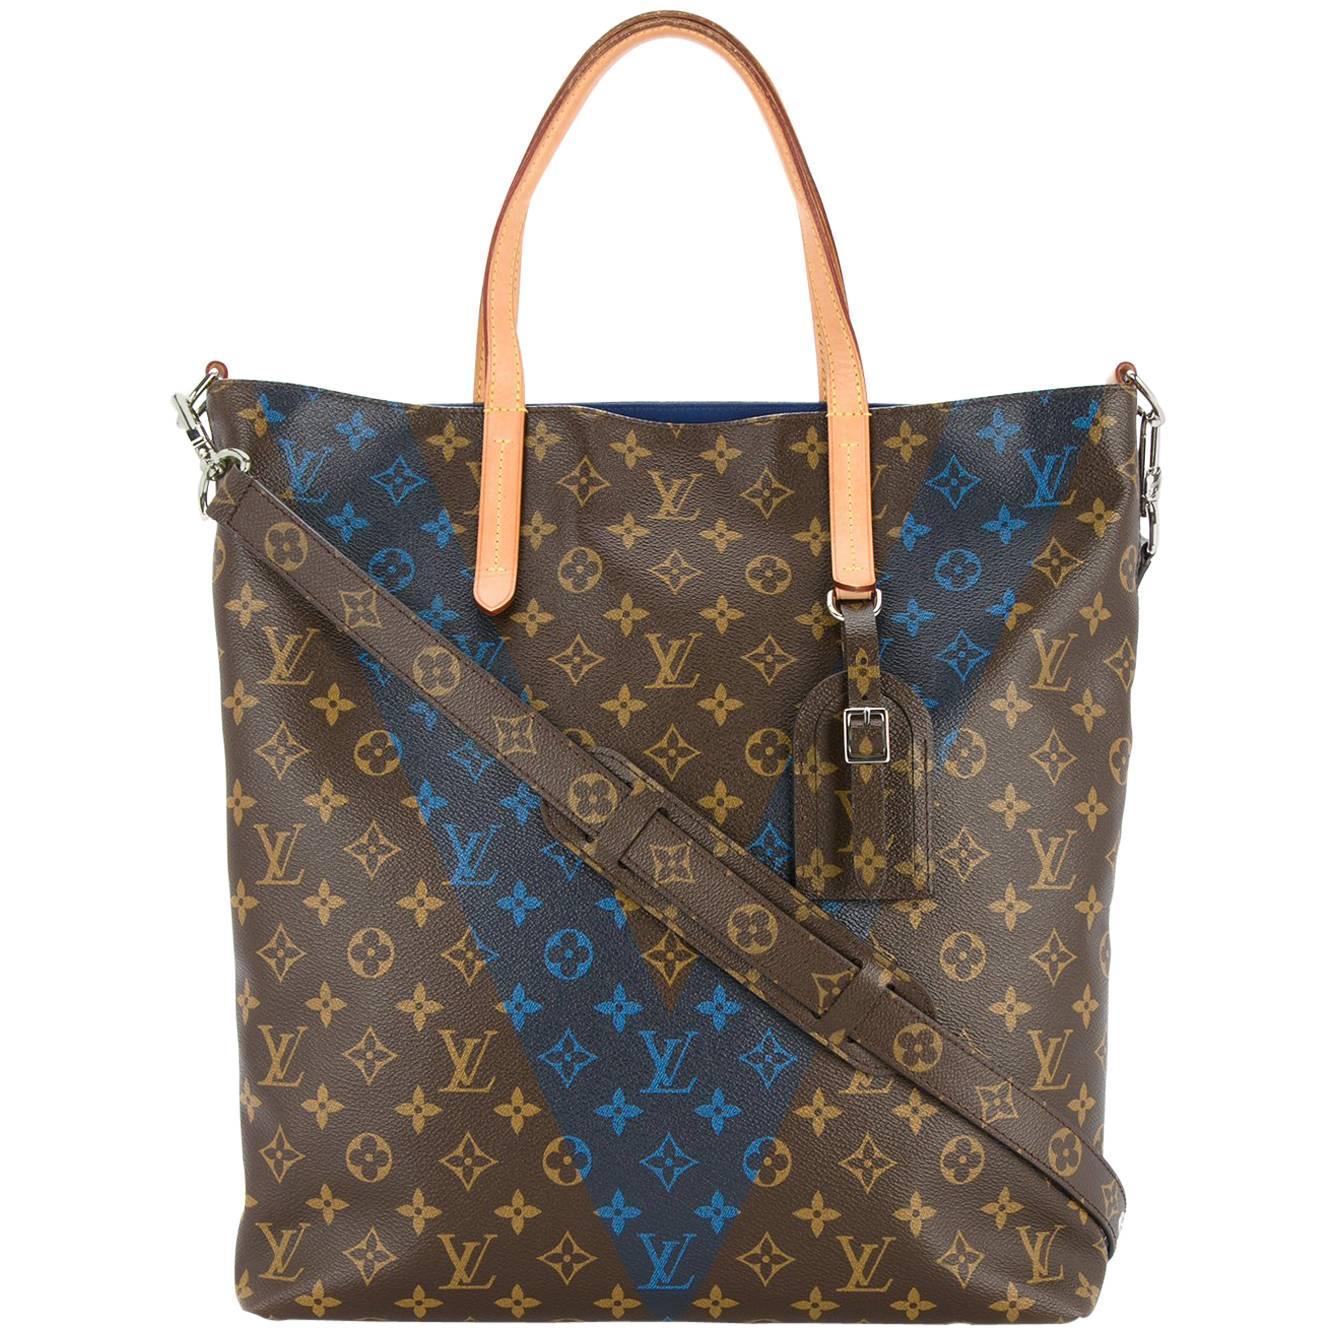 Louis Vuitton Monogram Mens Carryall Travel Tote Shoulder Bag LukKXcLcsv